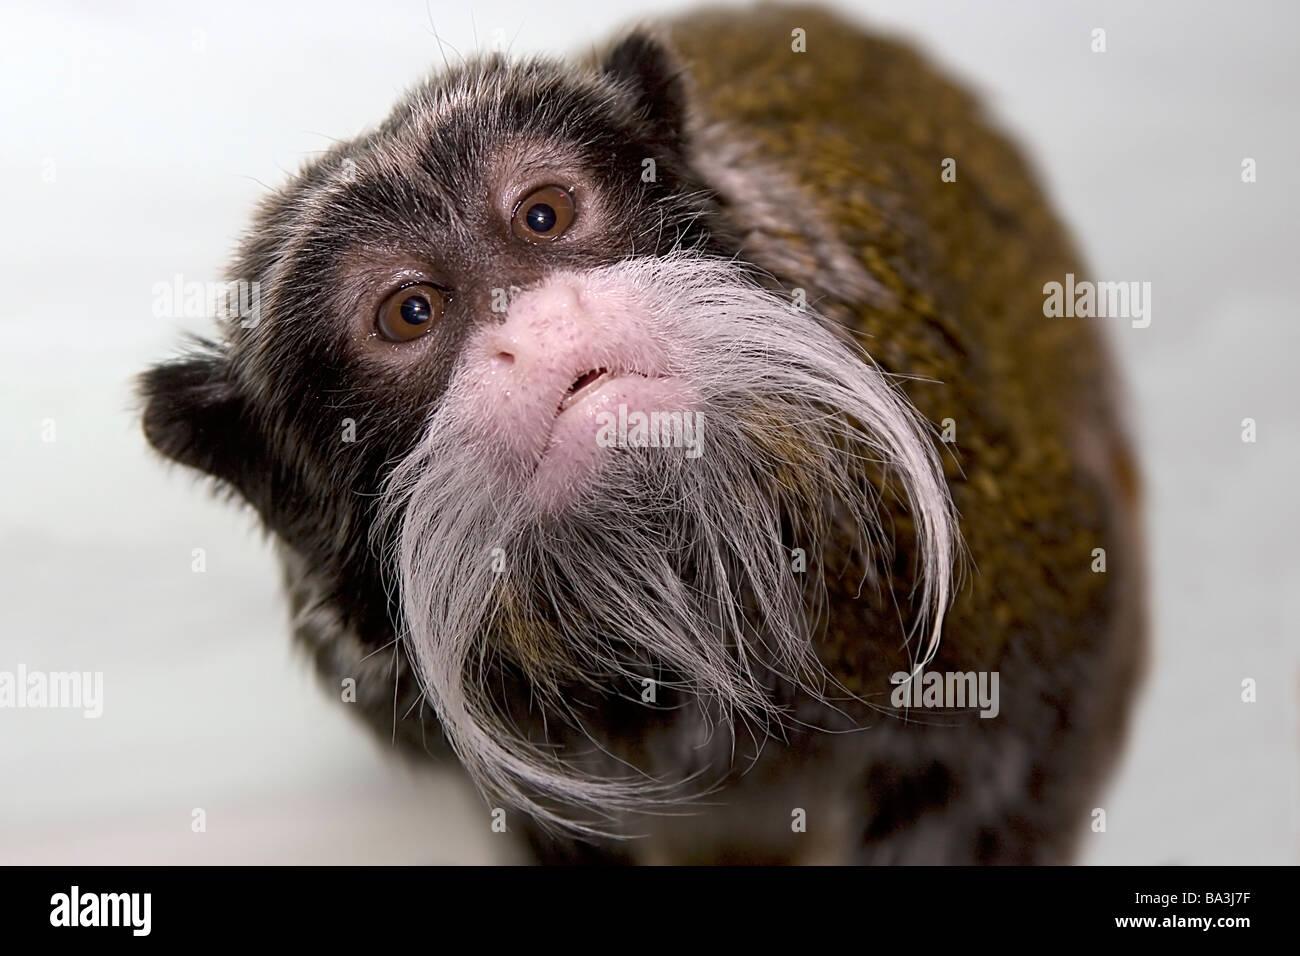 Kaiser Tamarin neugierige neugierige Affe frech Schnurrbart Saguinus imperator Stockbild